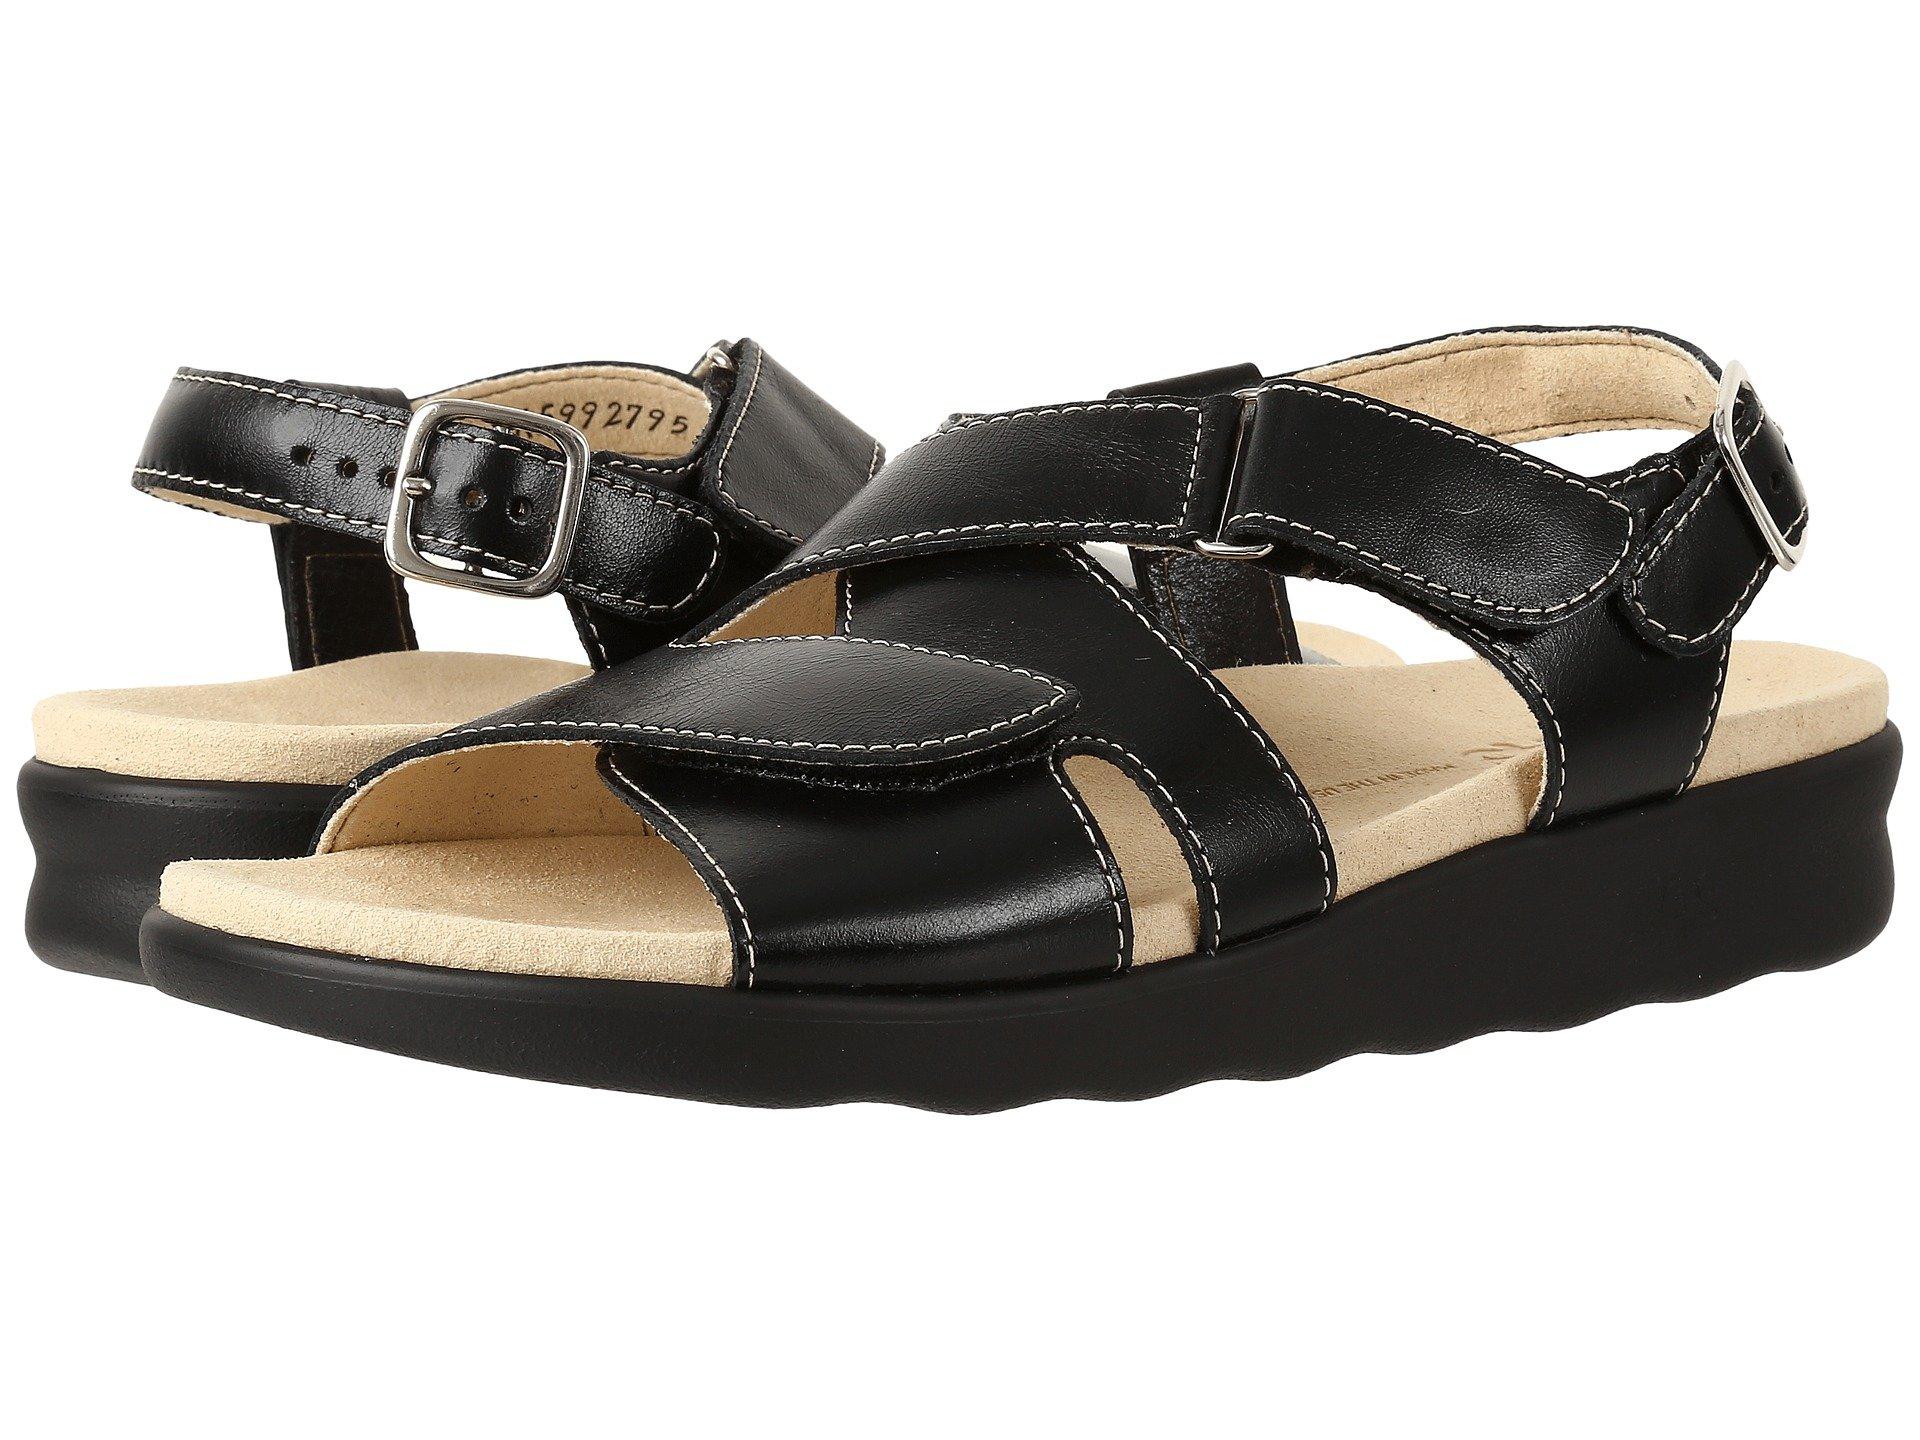 Sas Shoes Huggy  Black Wide